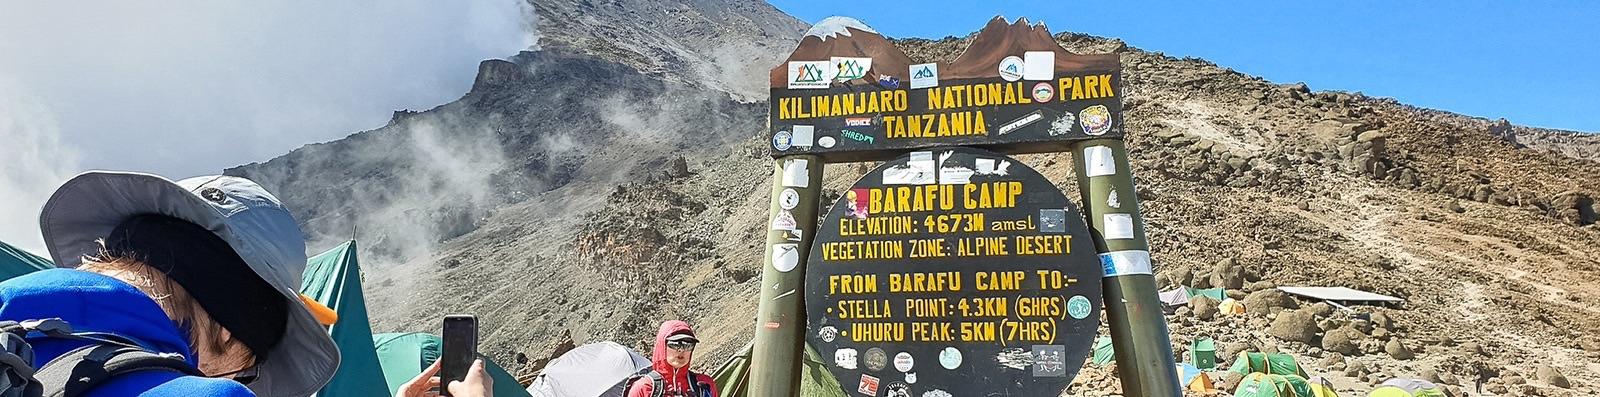 Kilimanjaro climb in July